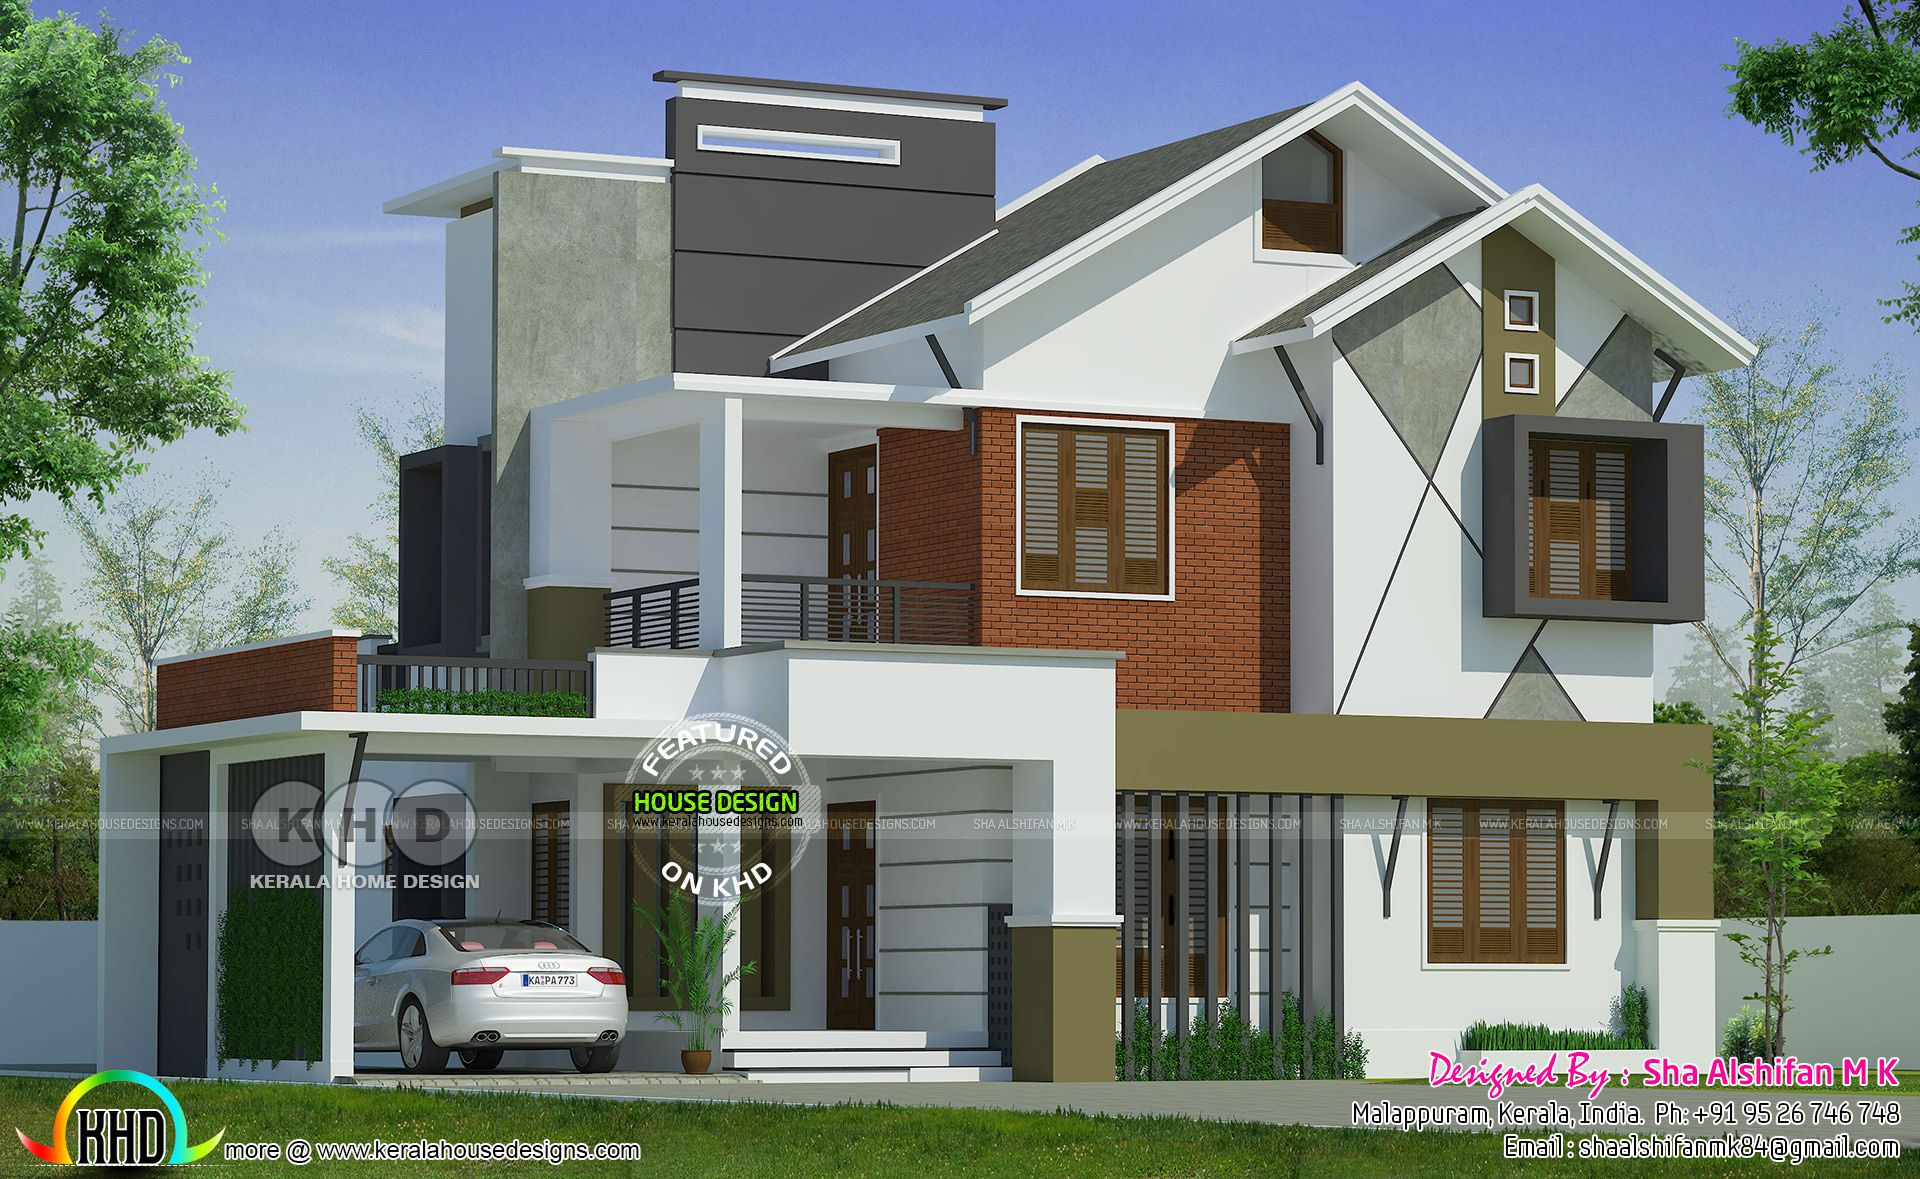 2153 square feet 4 bedroom mixed roof Kerala home